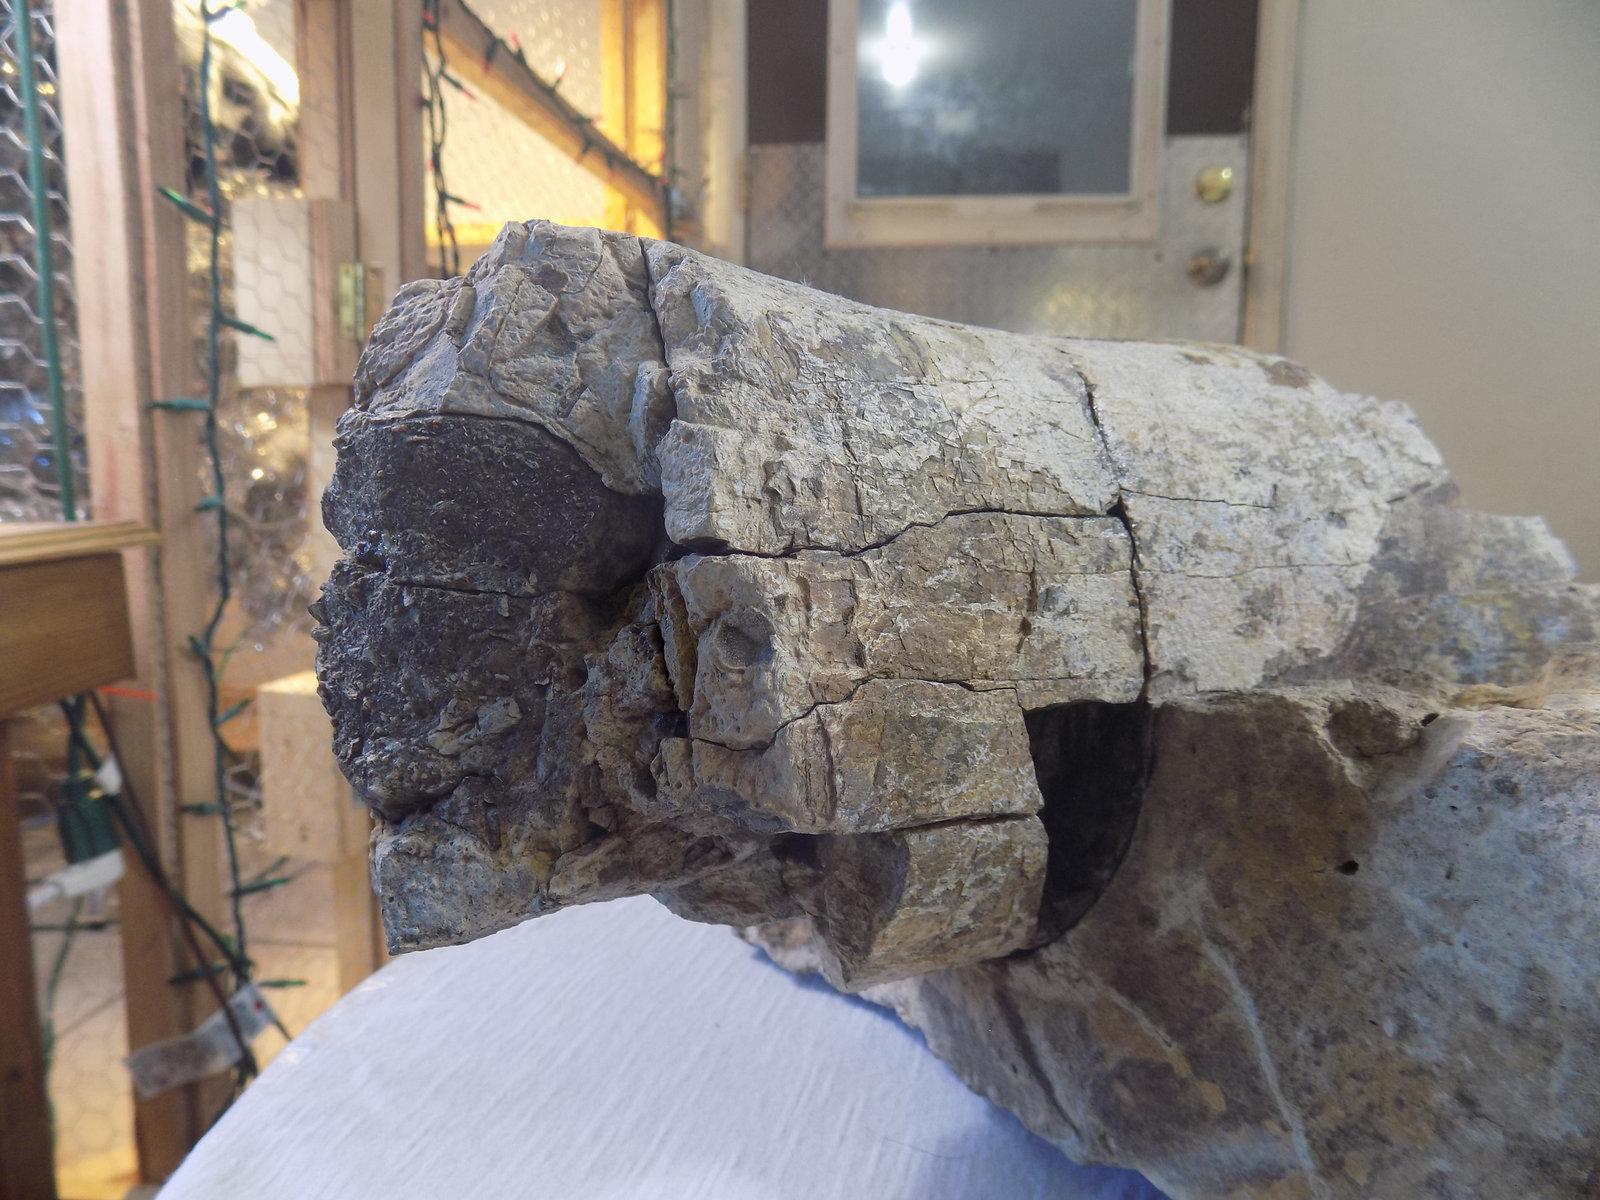 Possibly a femur bone in matrix